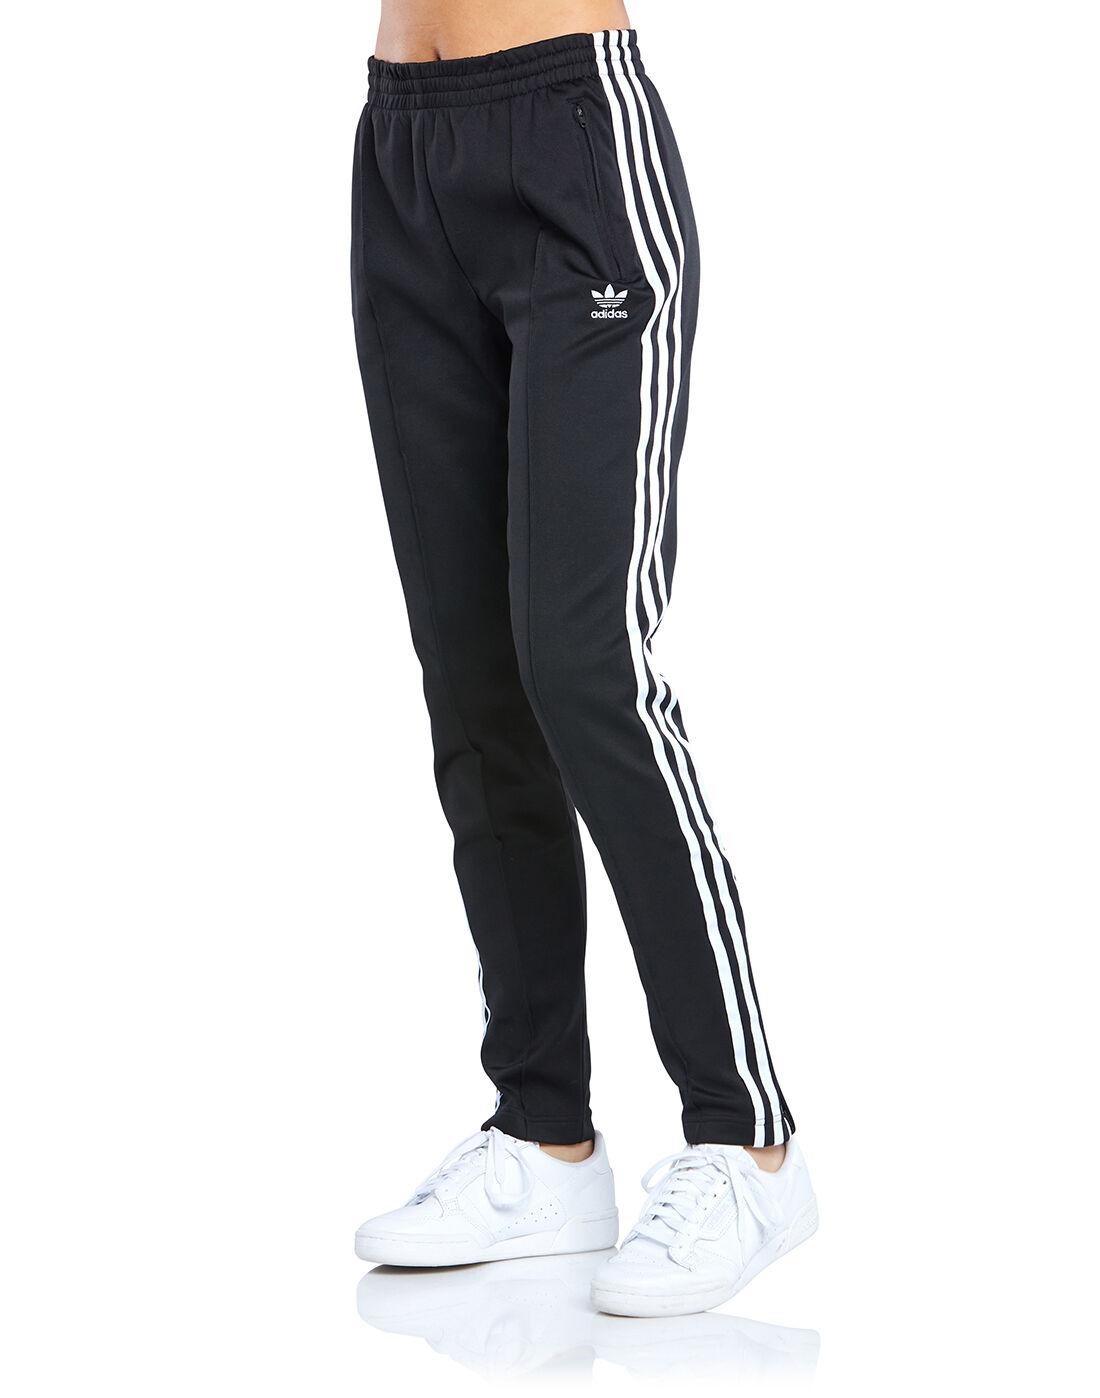 adidas track pants womens